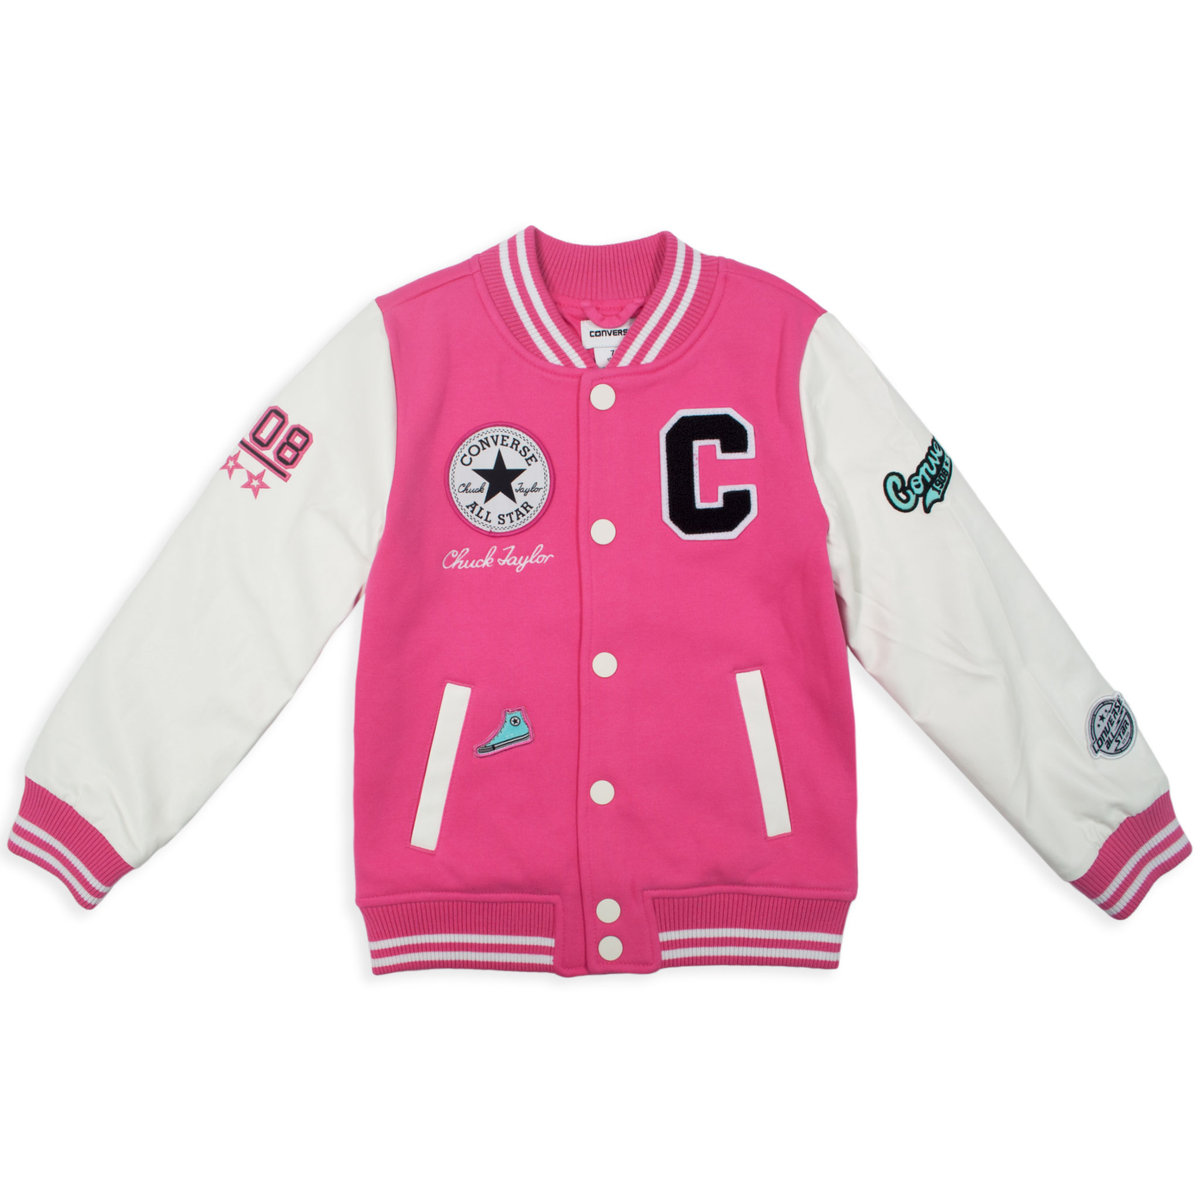 ee49656622fd1f CONVERSE Girls  Knit Varsity Jacket